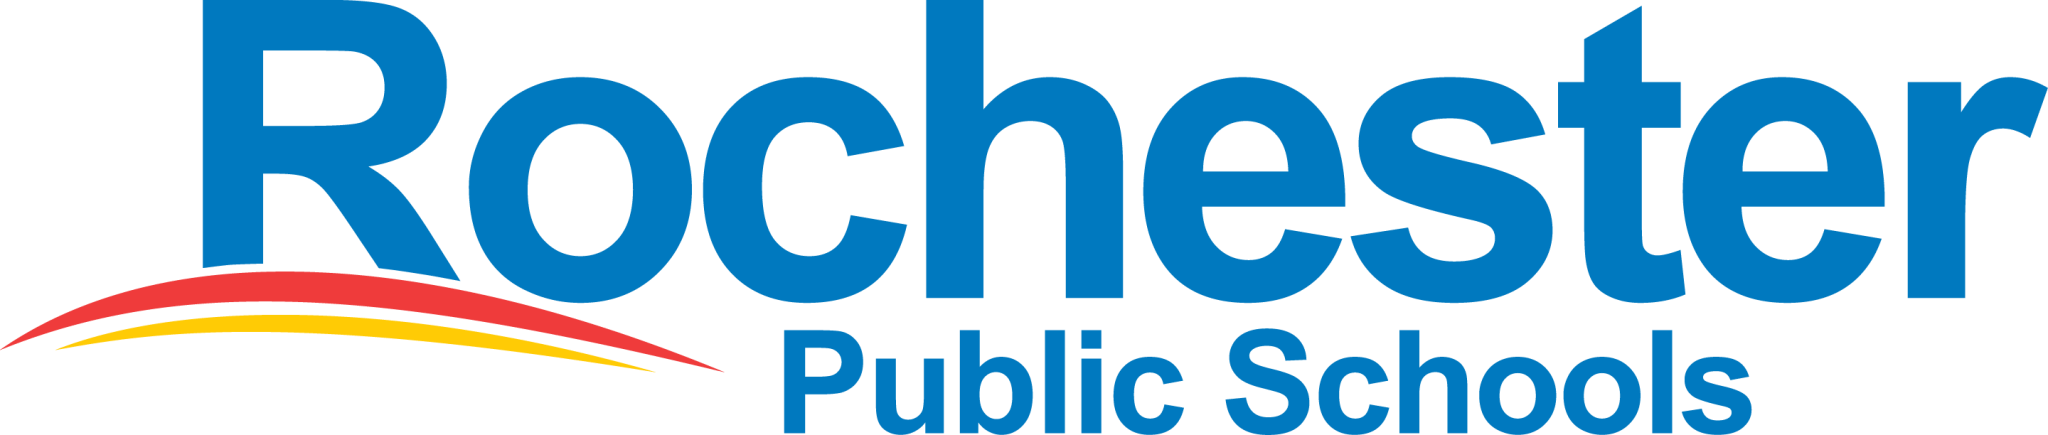 Video Production Education Rochester Public Schools